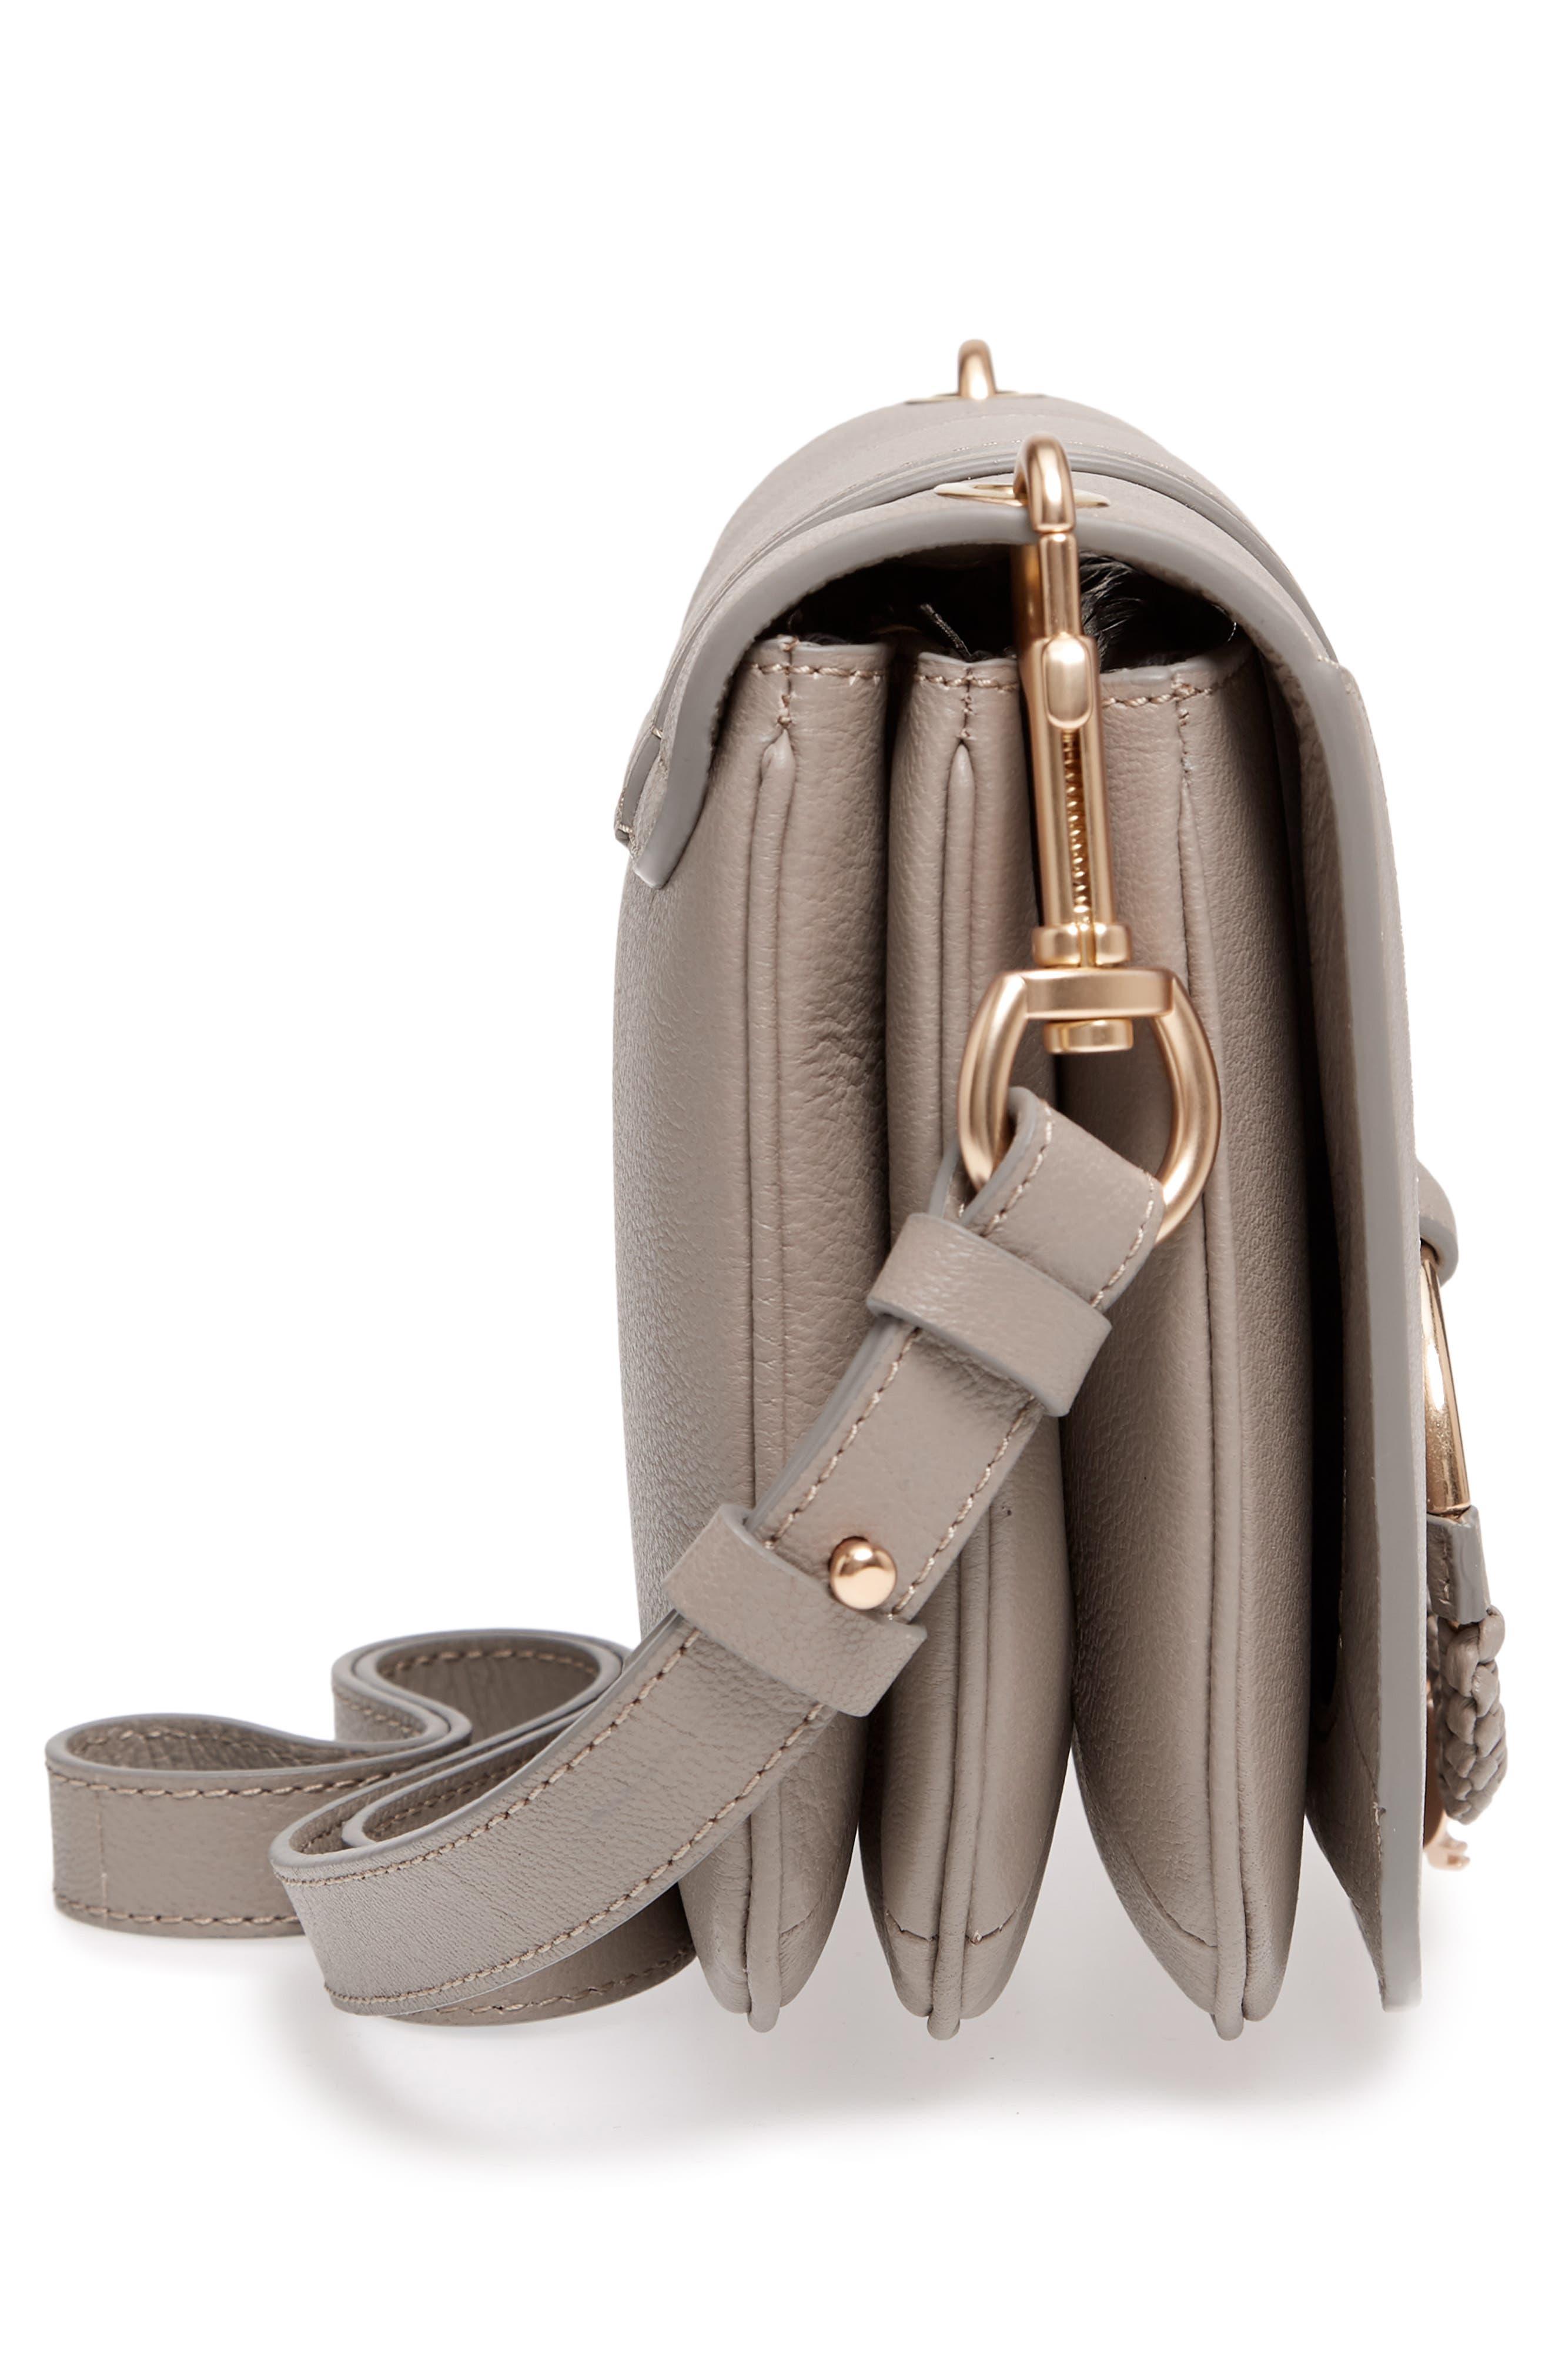 Hana Small Leather Crossbody Bag,                             Alternate thumbnail 7, color,                             Motty Grey